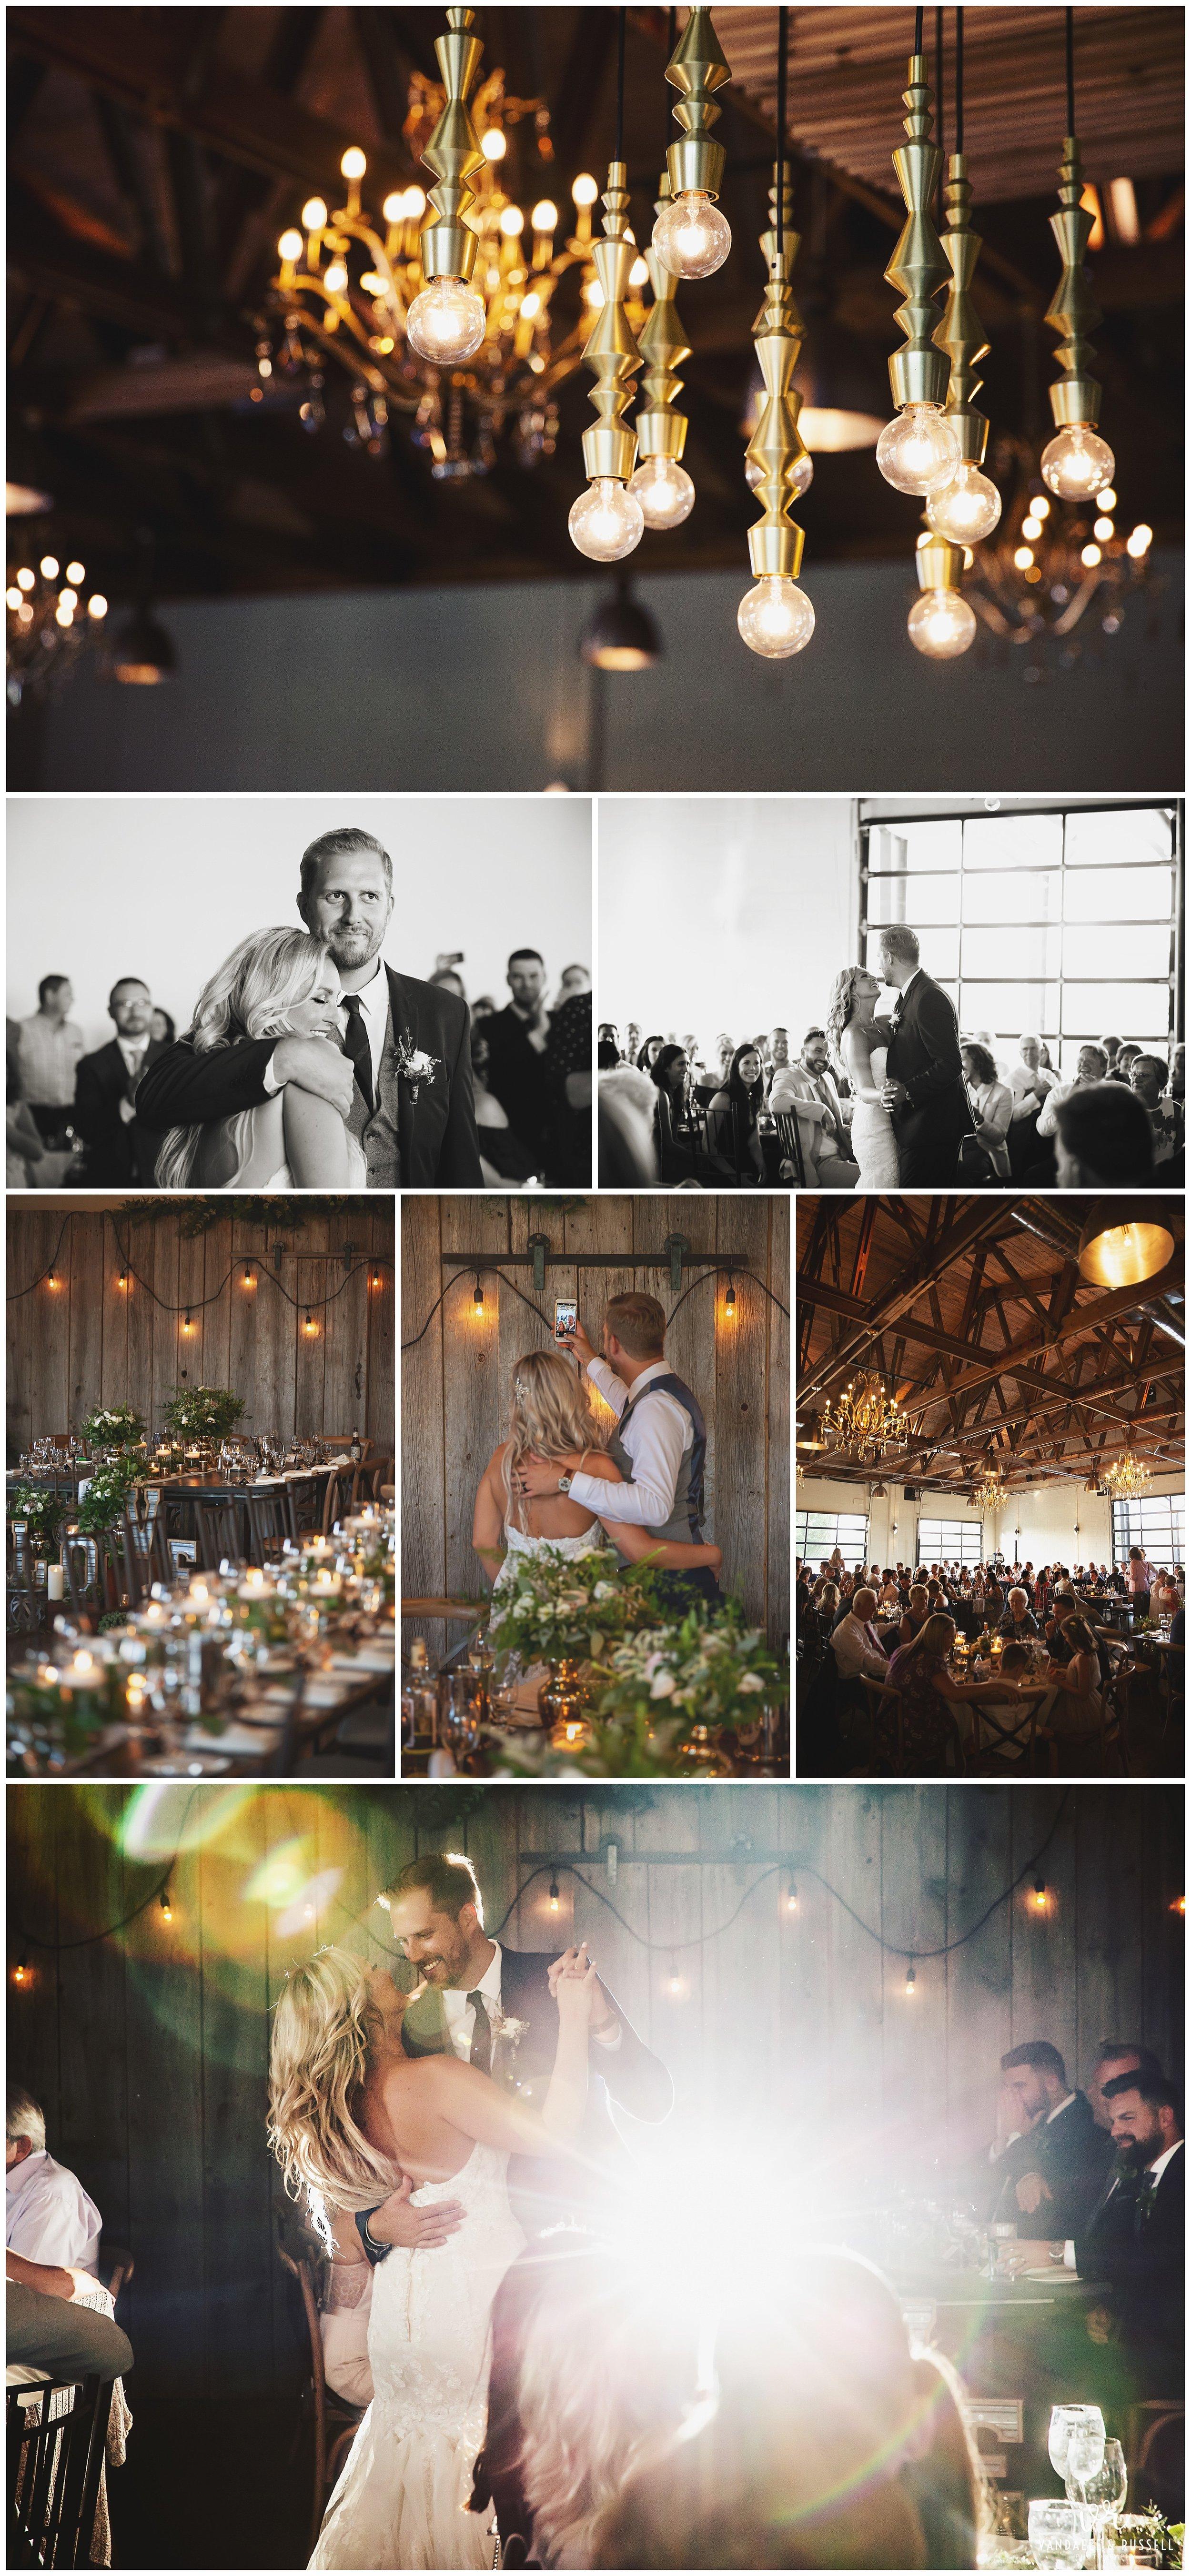 VanDaele-Russell-Wedding-Photography-London-Toronto-Ontario_0178.jpg